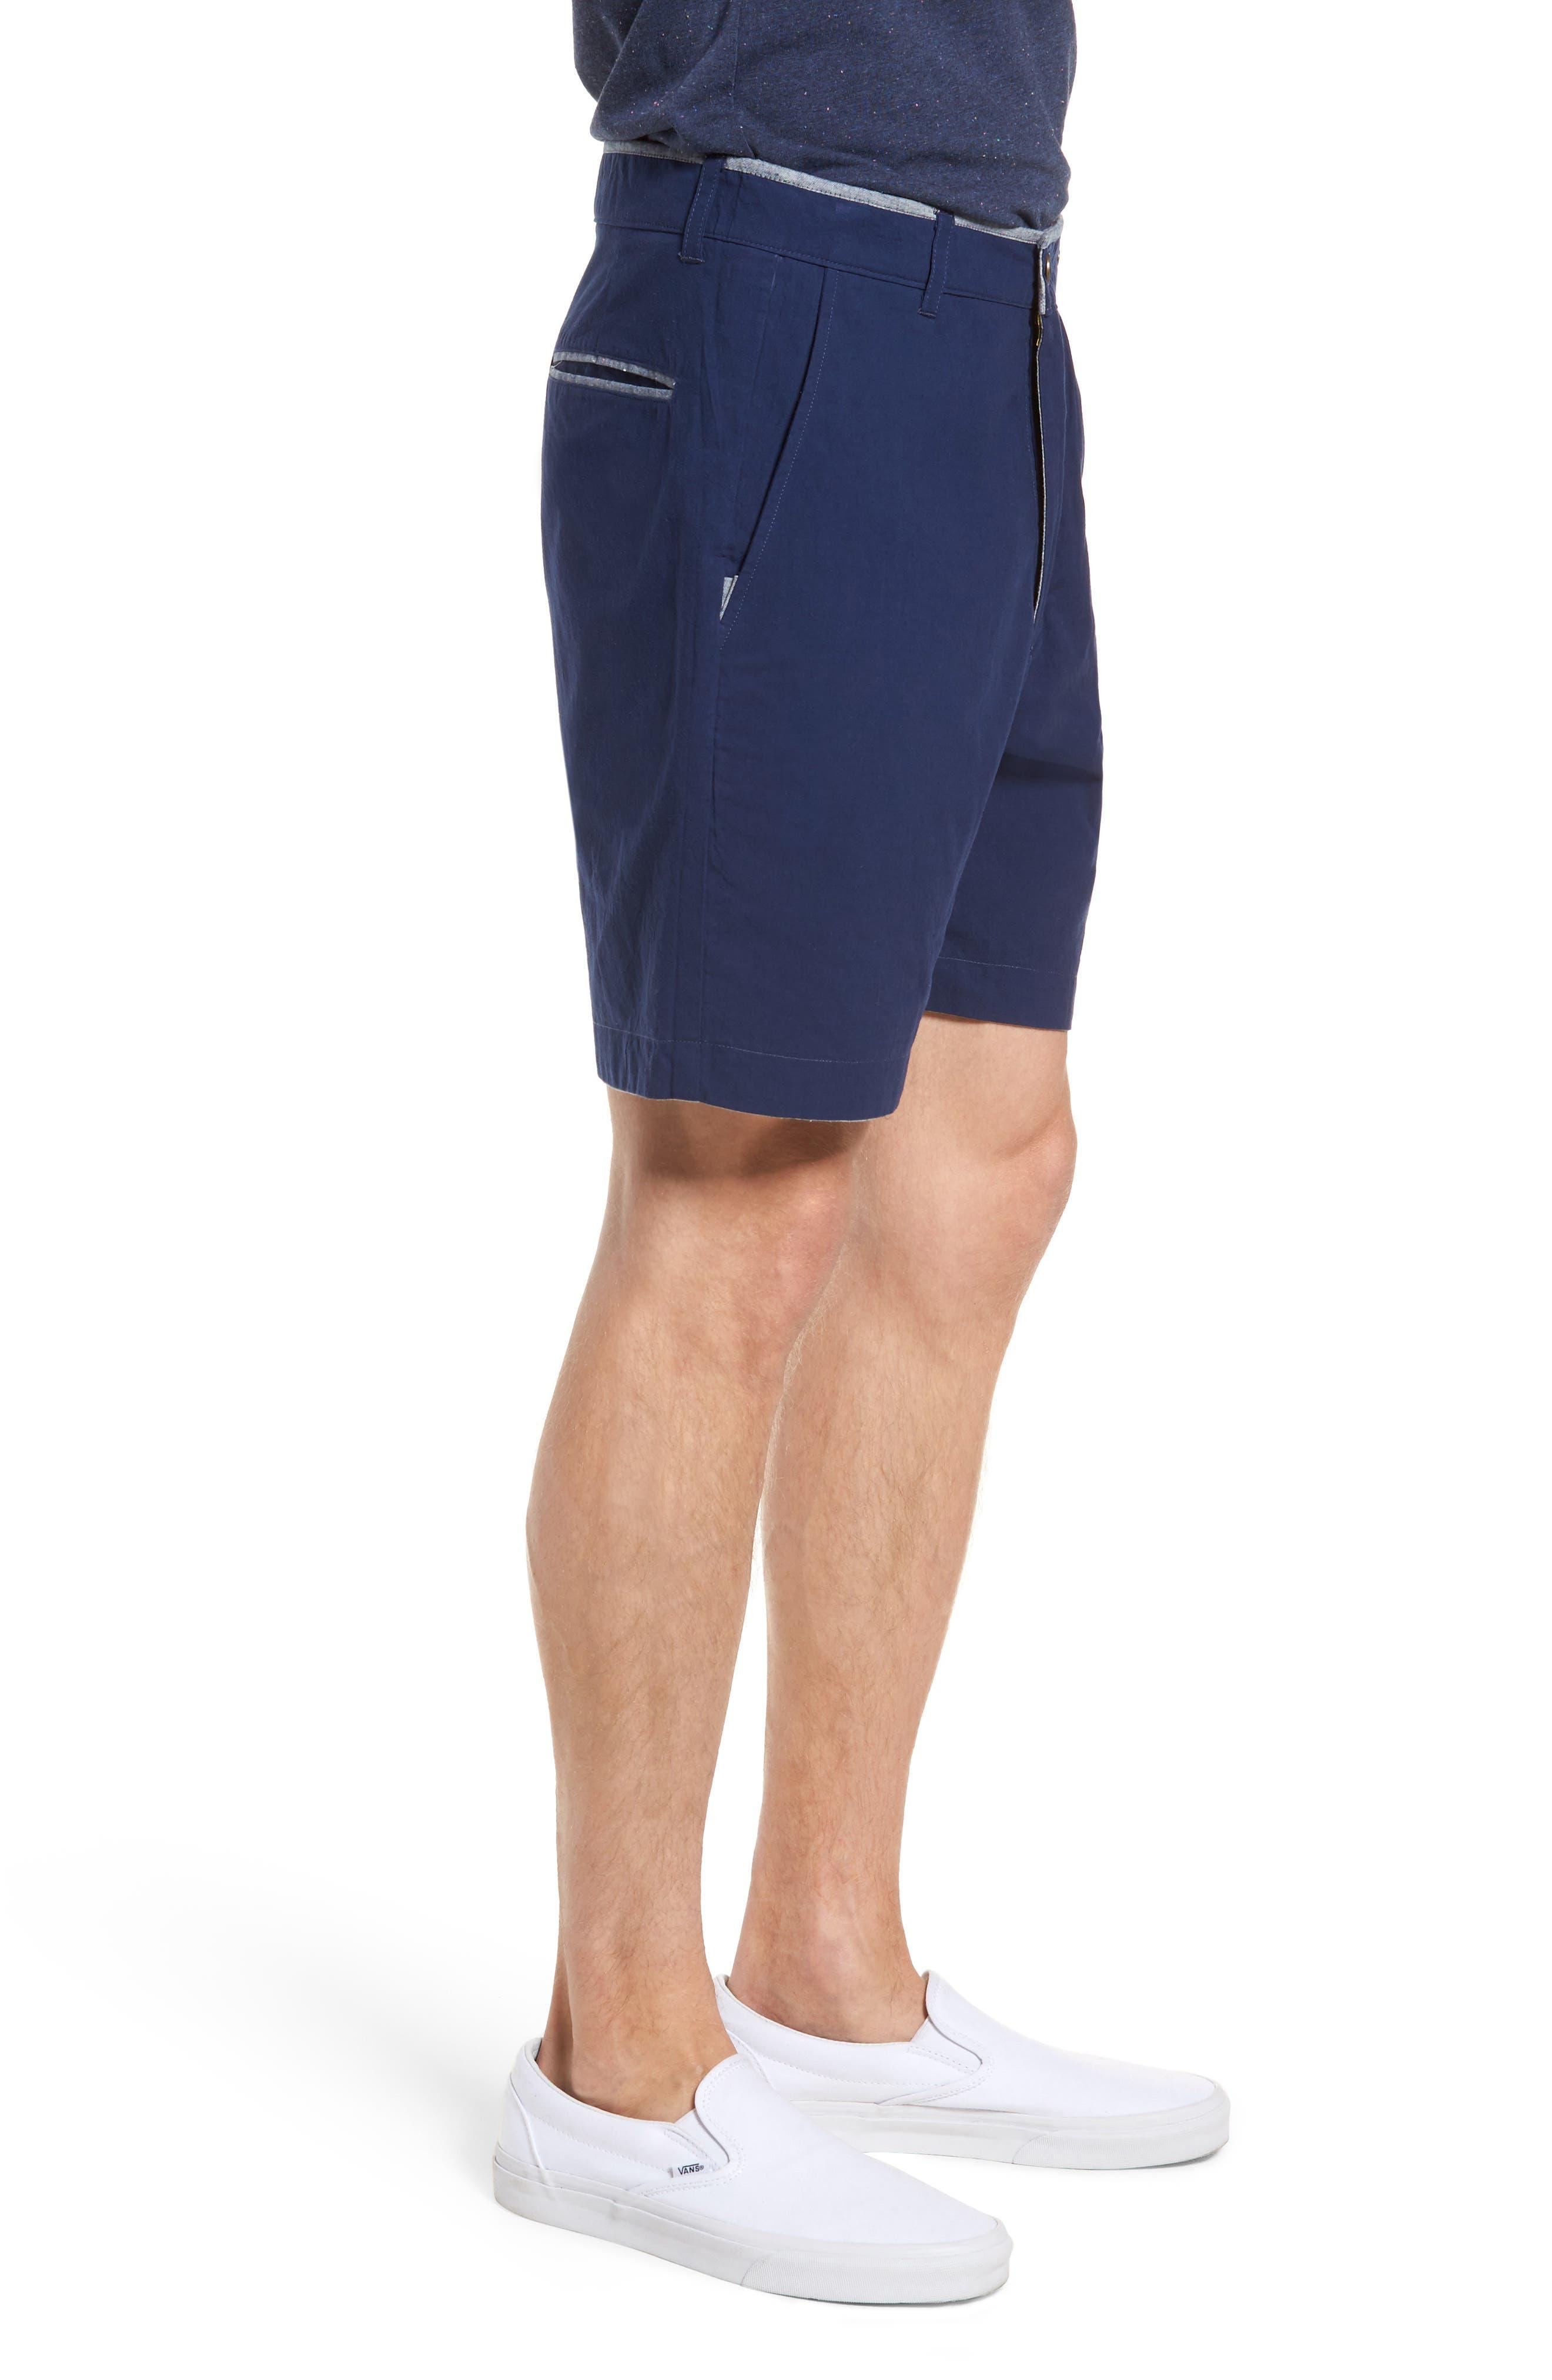 Rock Steady Reversible Shorts,                             Alternate thumbnail 4, color,                             Grey